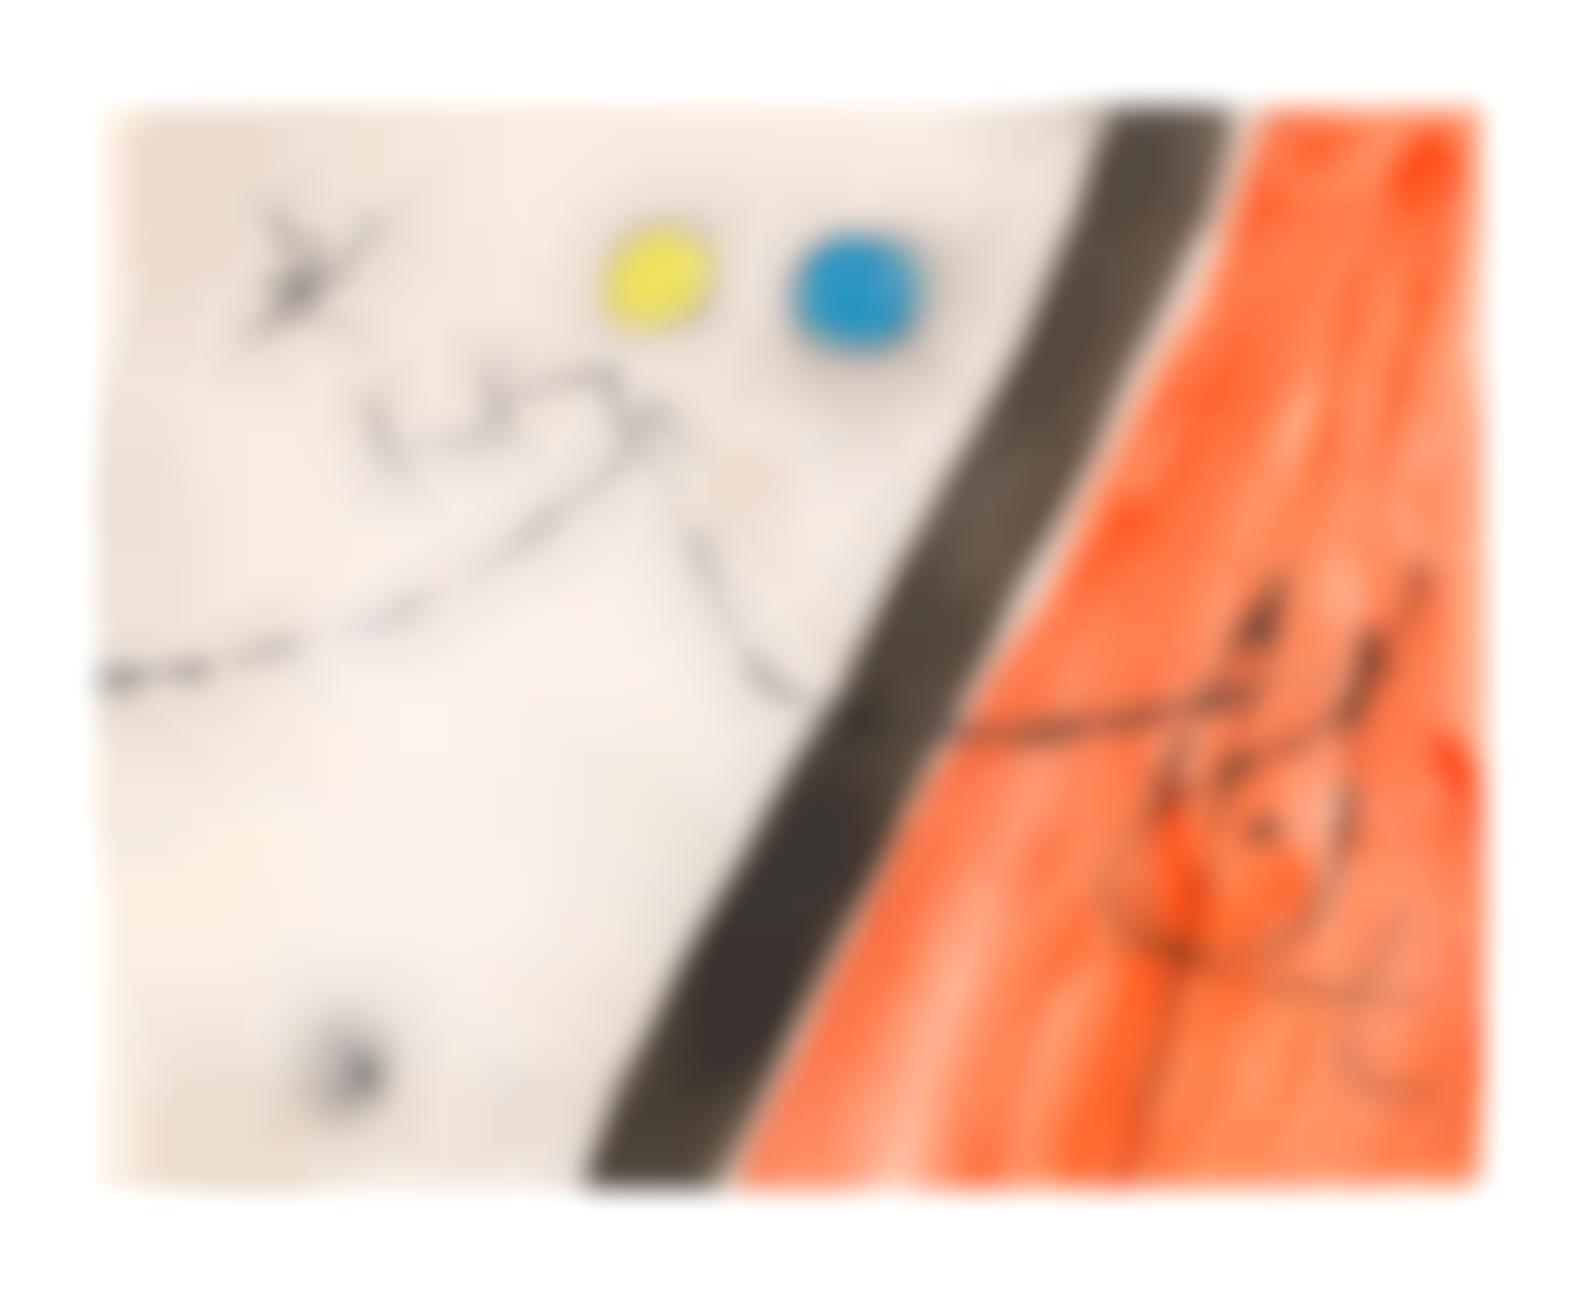 Joan Miro-Oiseau, Etoile, Constellations I-1977